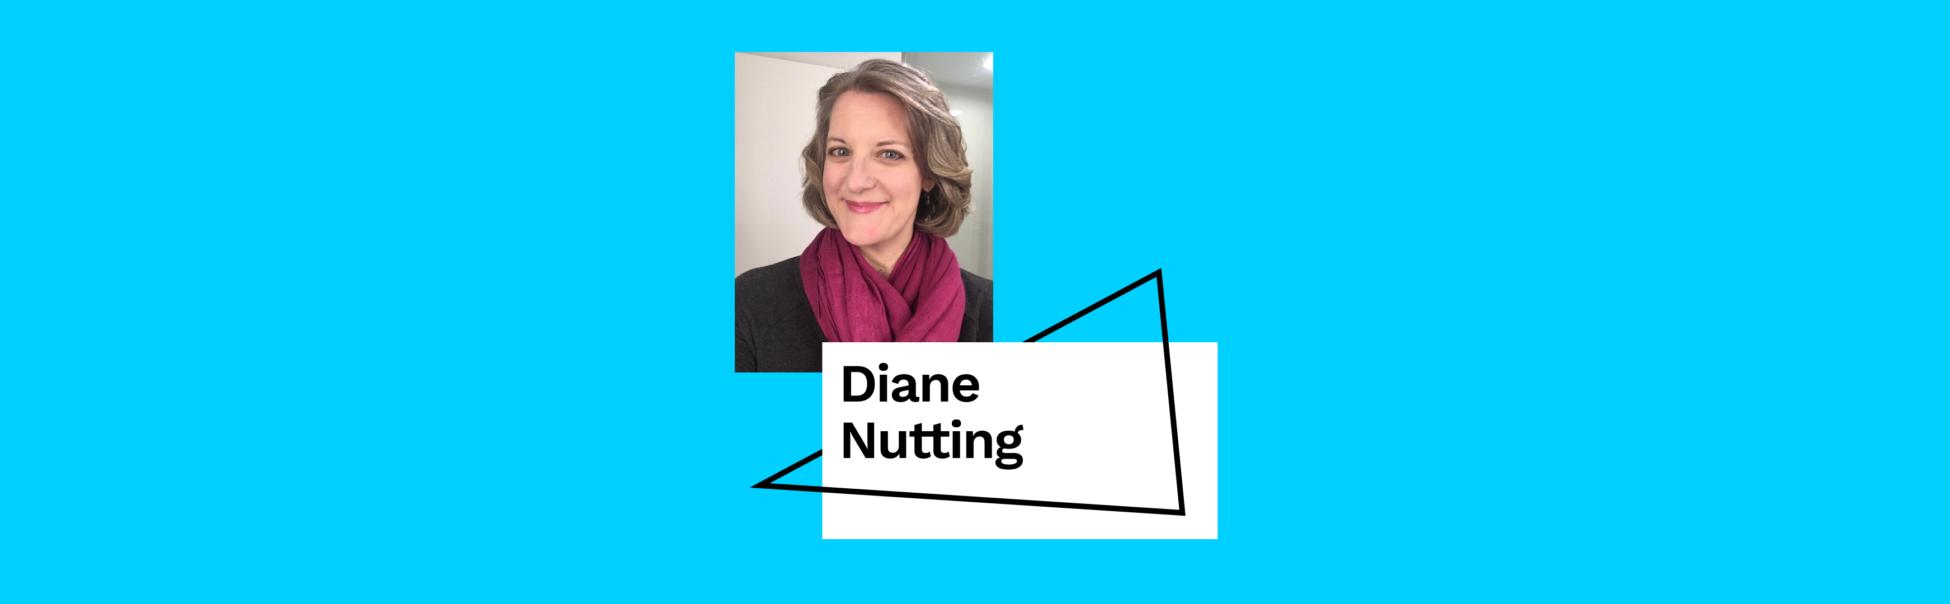 Diane Nutting